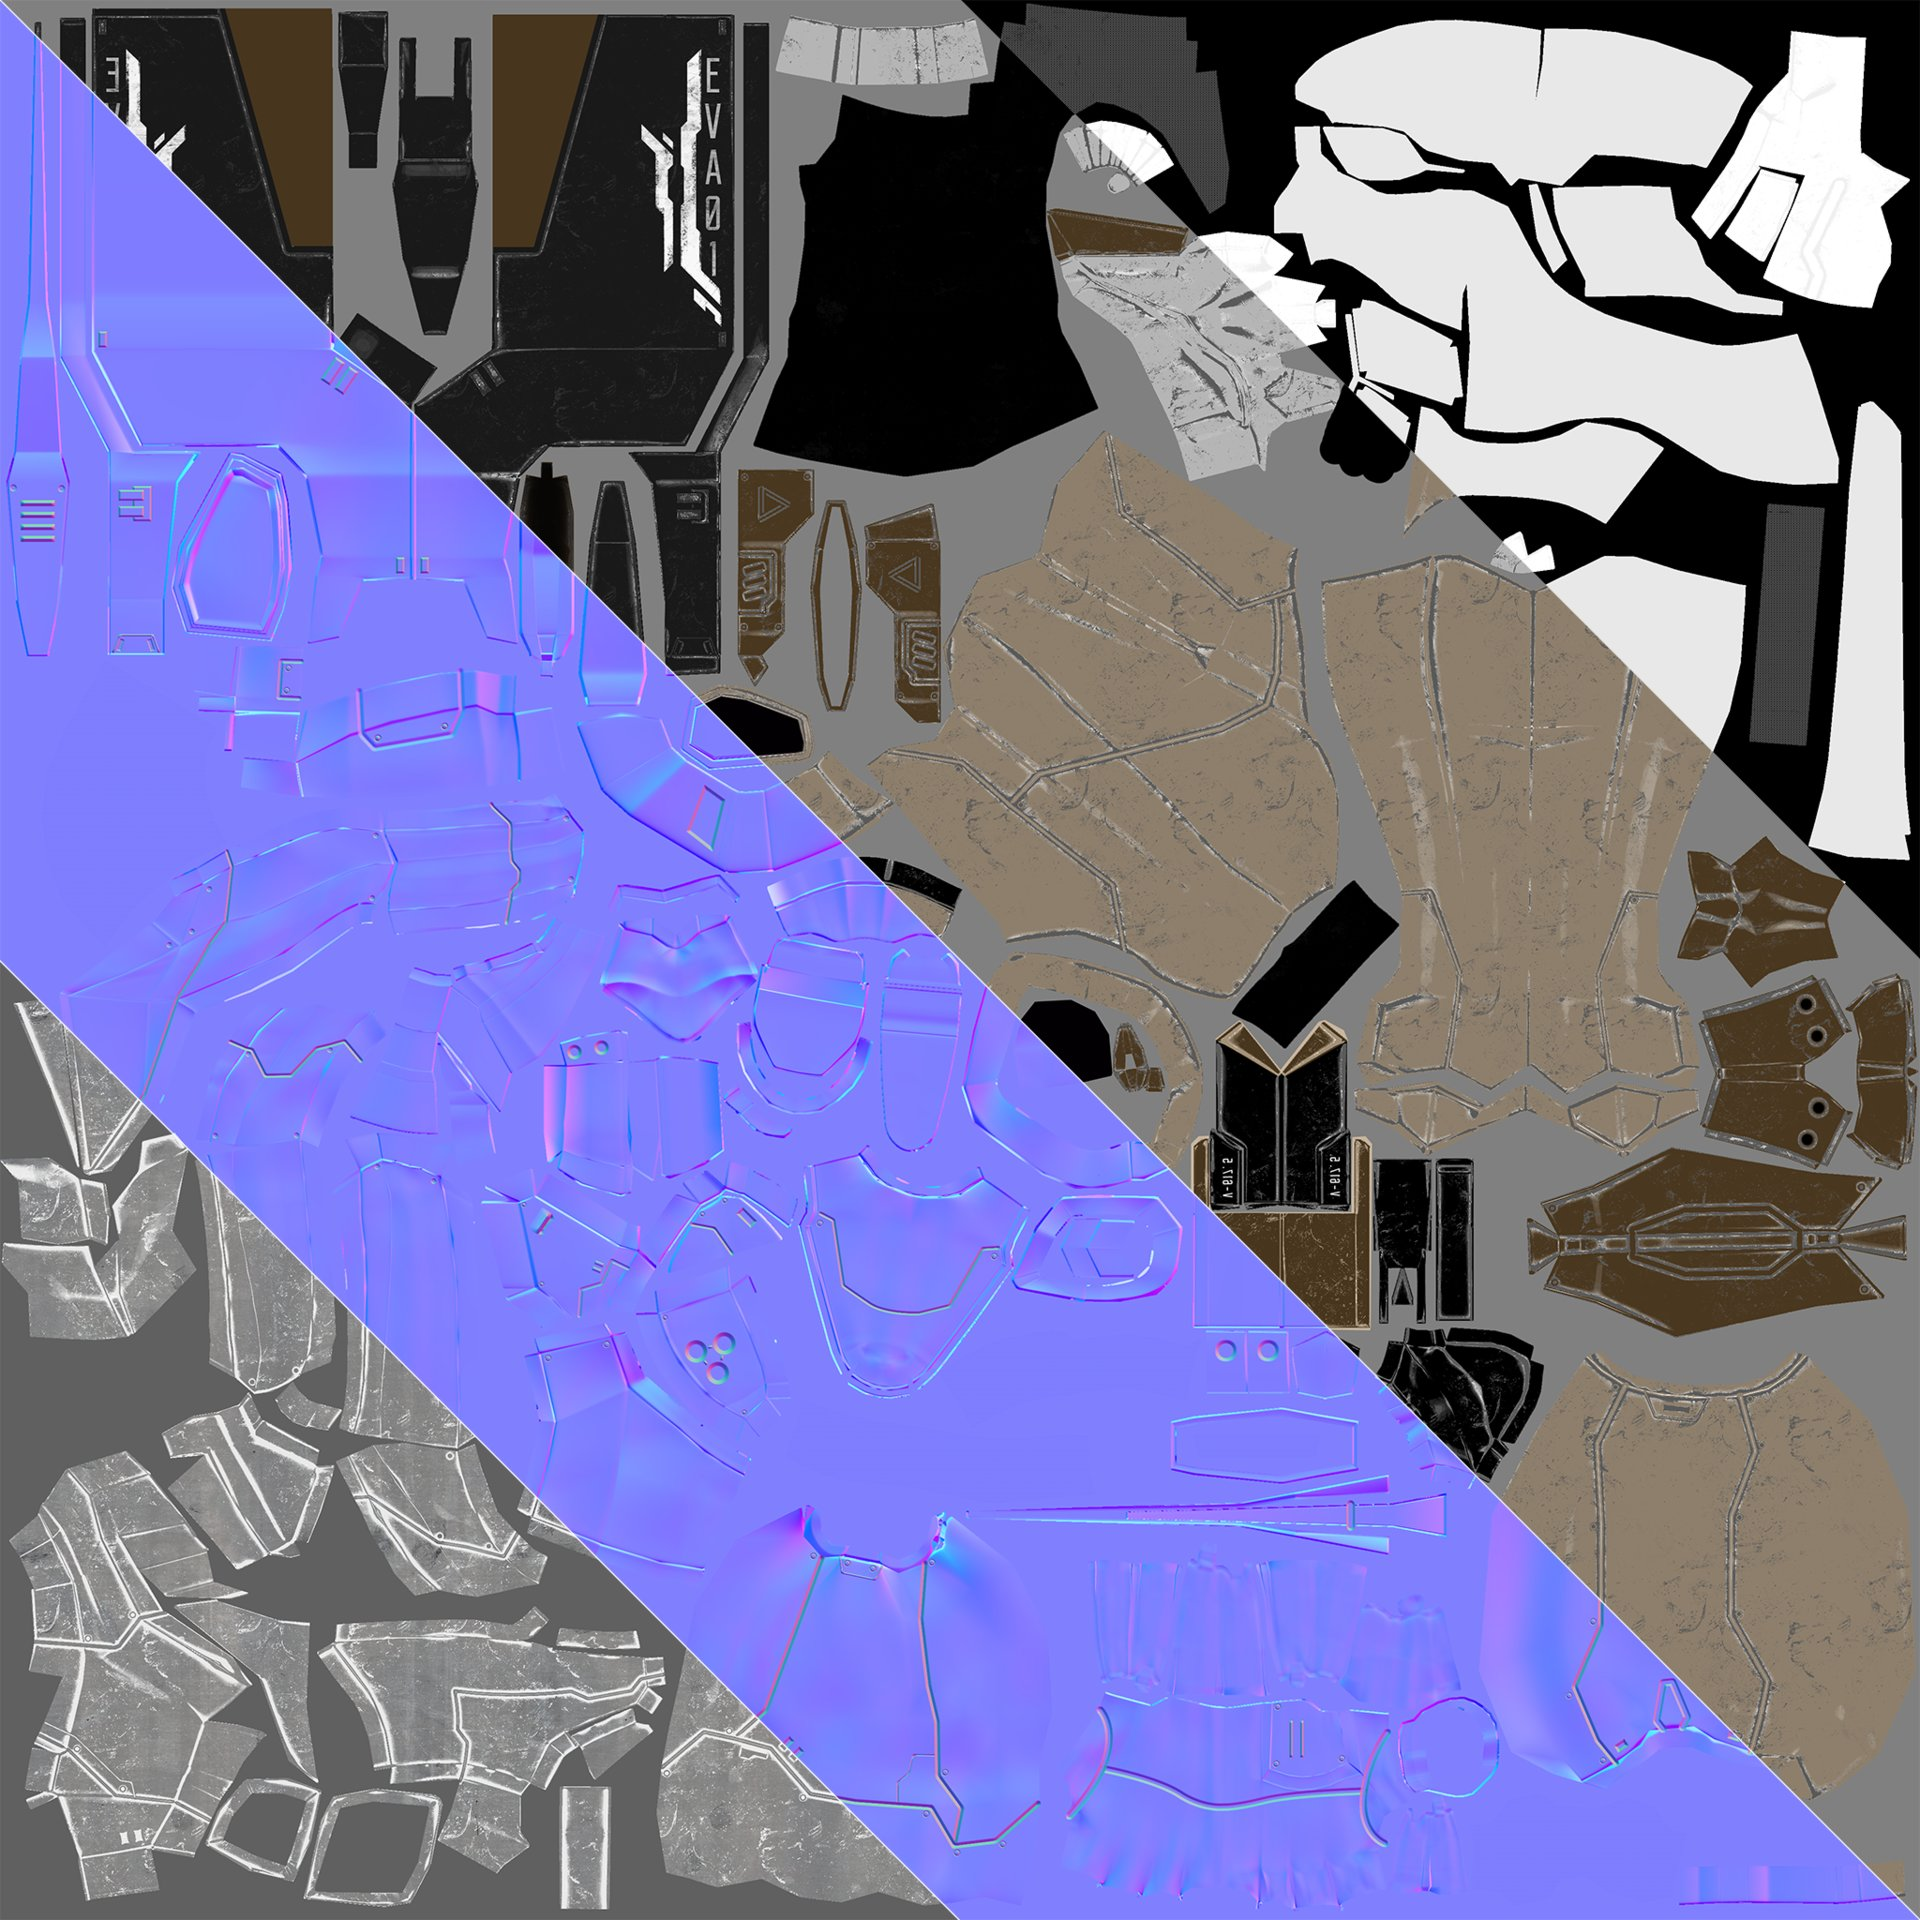 Johan sallstrom eva textures